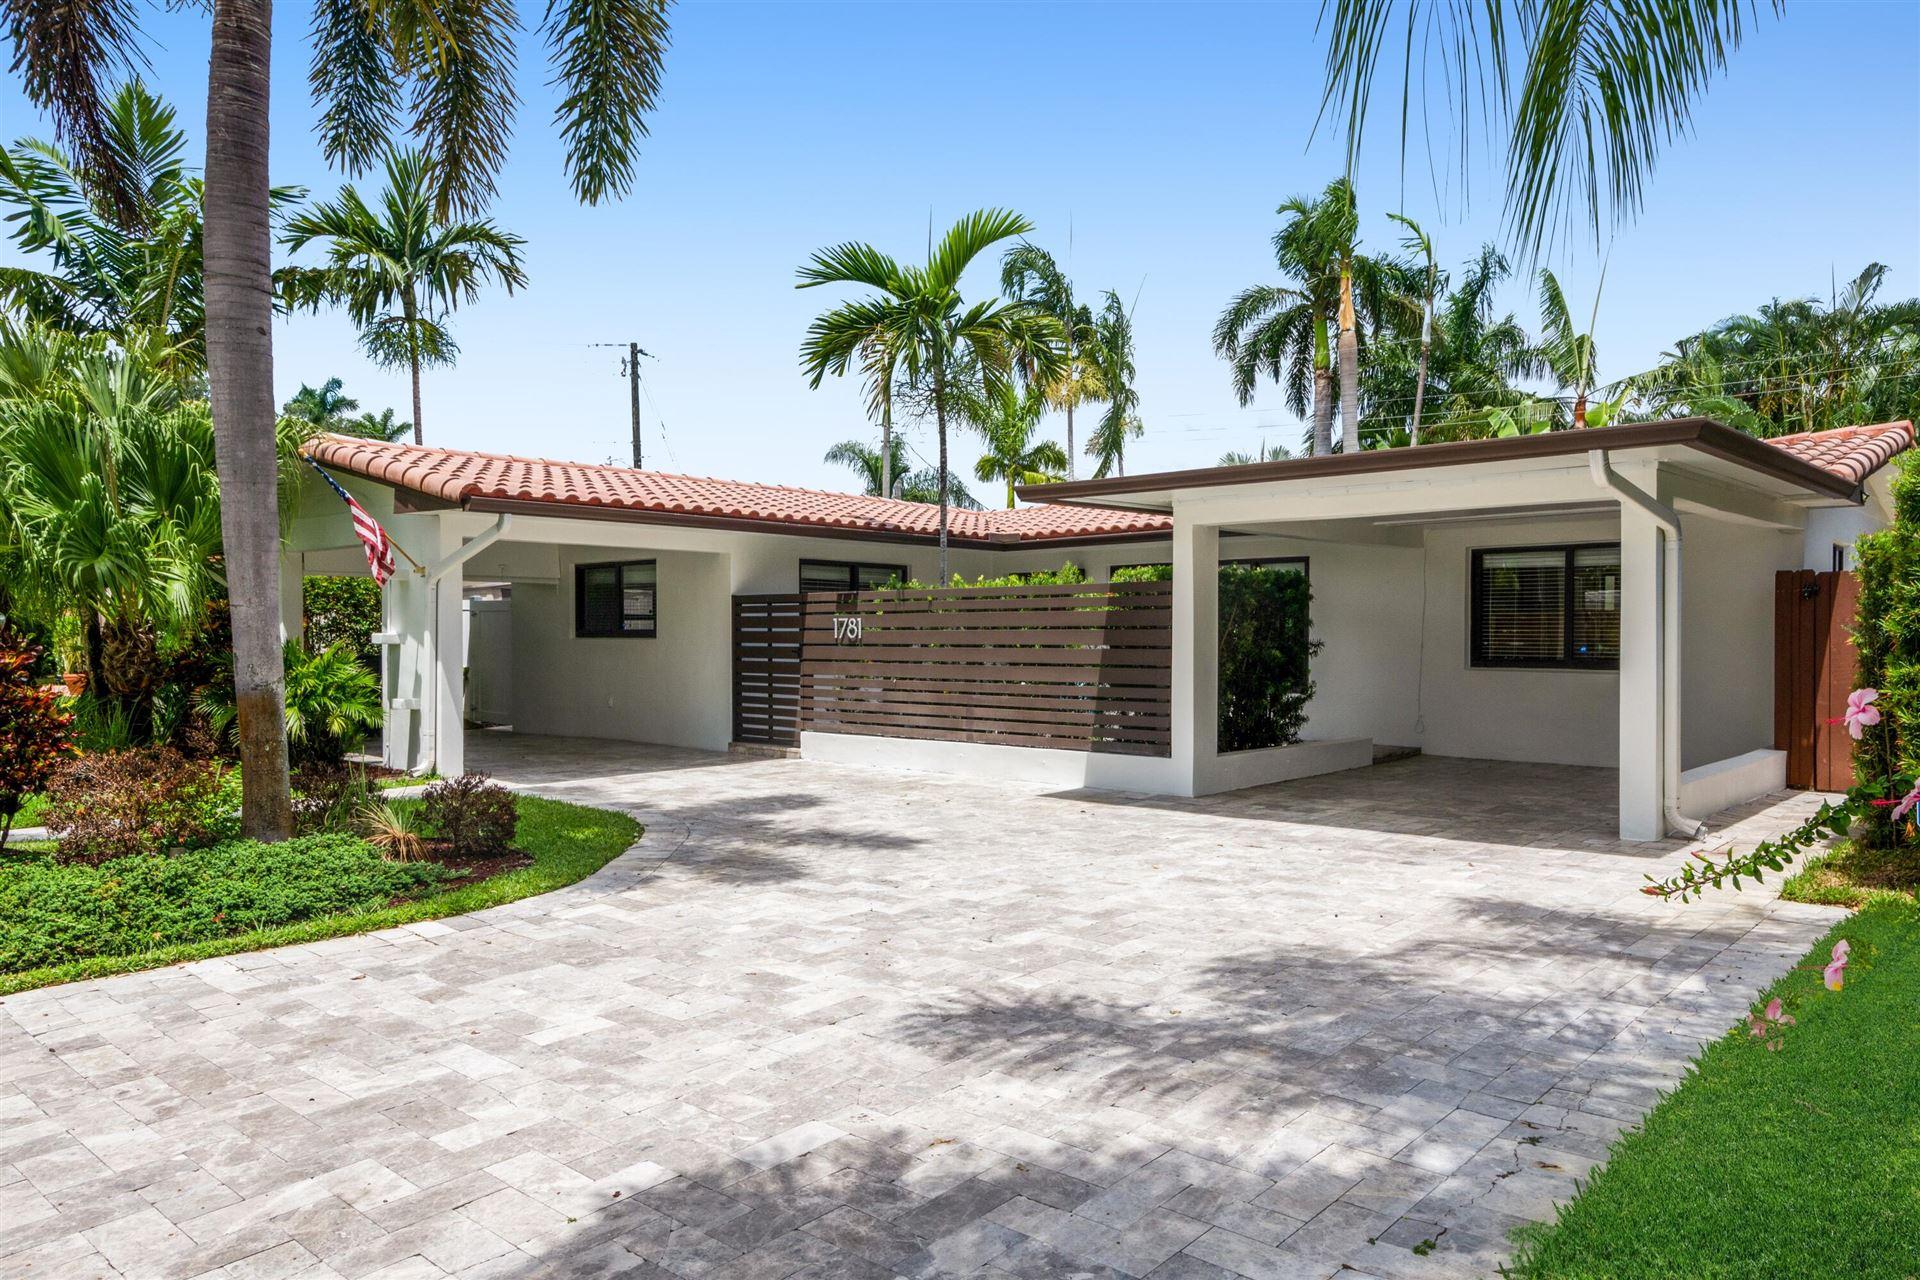 Photo of 1781 NE 19th Street, Fort Lauderdale, FL 33305 (MLS # RX-10741896)